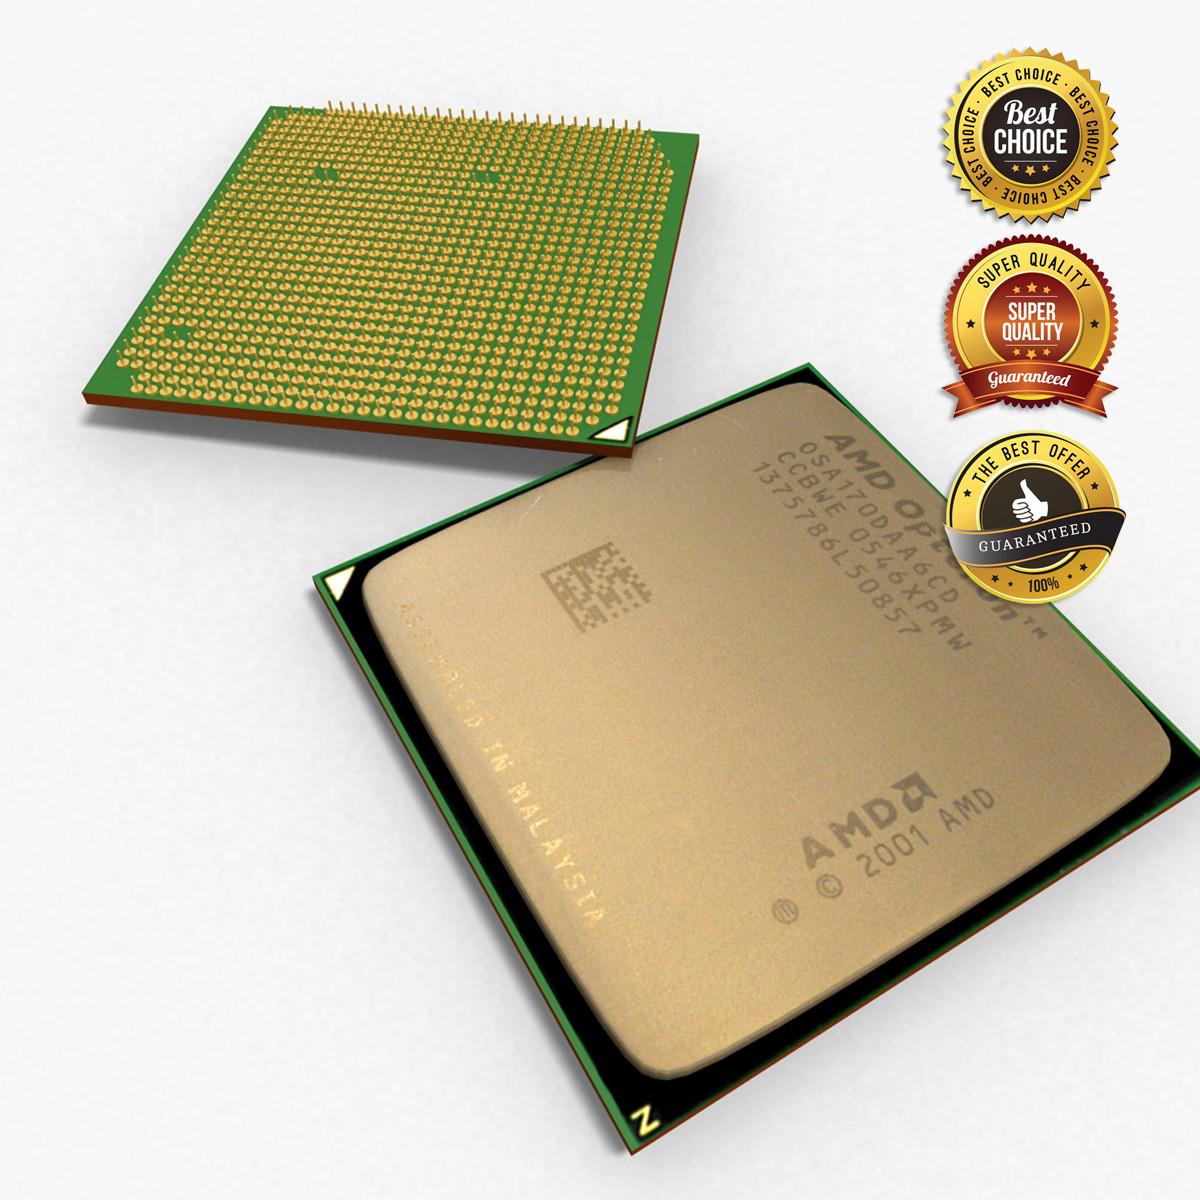 AMD Opteron 880 - main.jpg